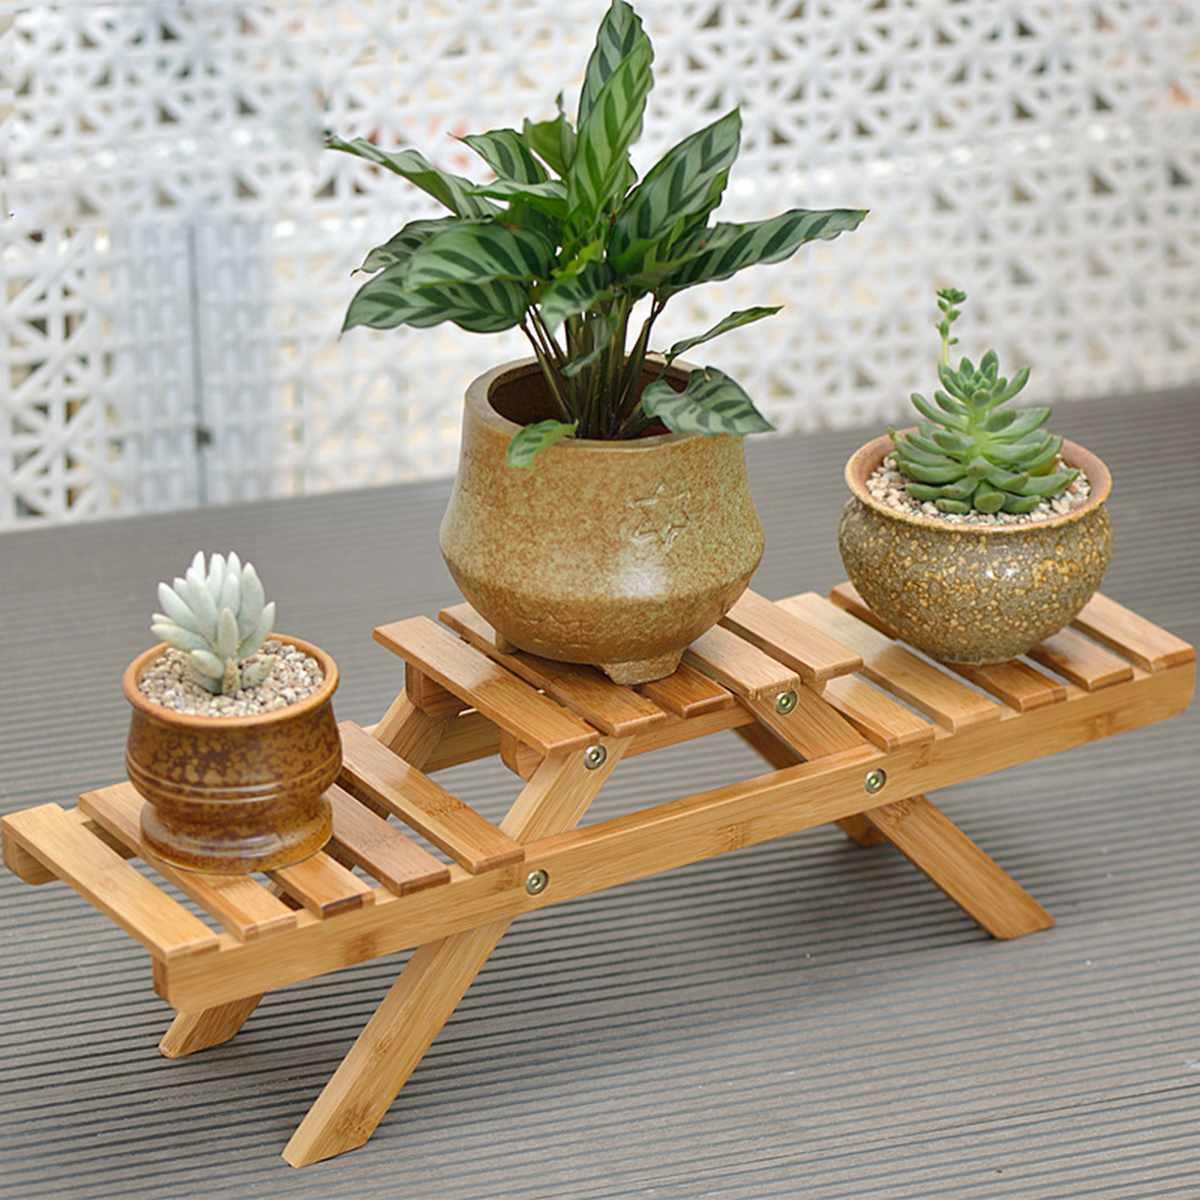 Bamboo Plant Flower Shelf Stand Flower Pot Rack Holder Garden Living Room Table Planter Display Stand Home Decor Indoor Outdoor